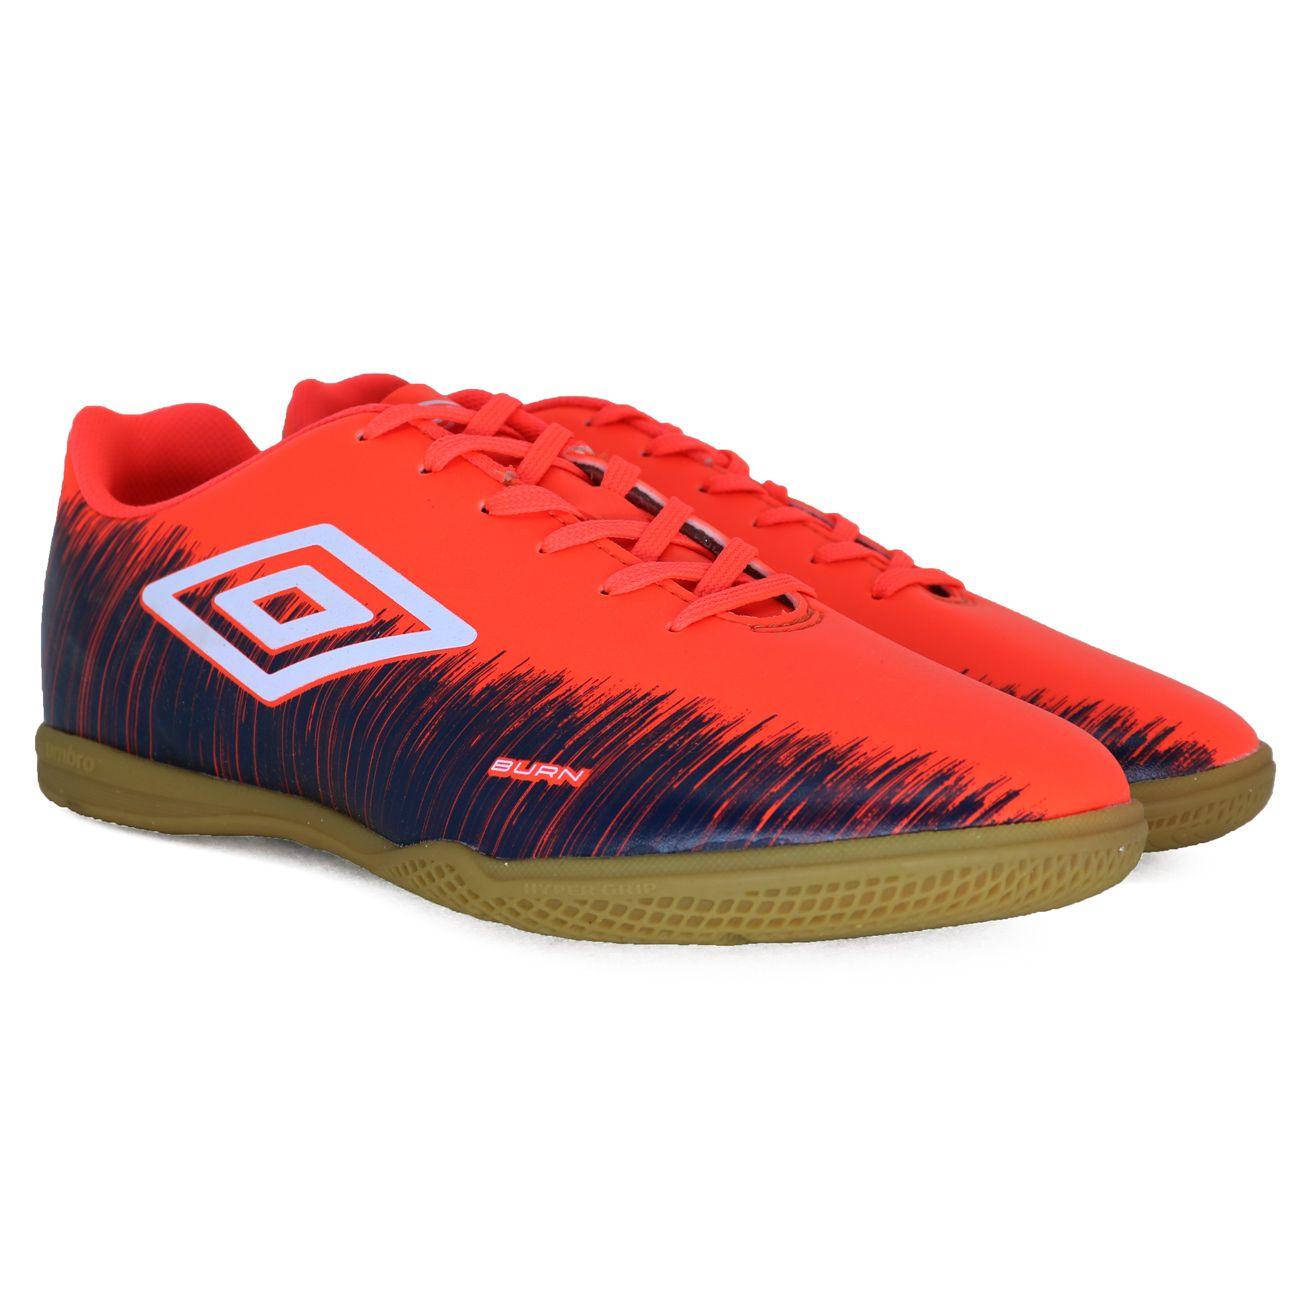 Chuteira Umbro Burn Futsal Coral